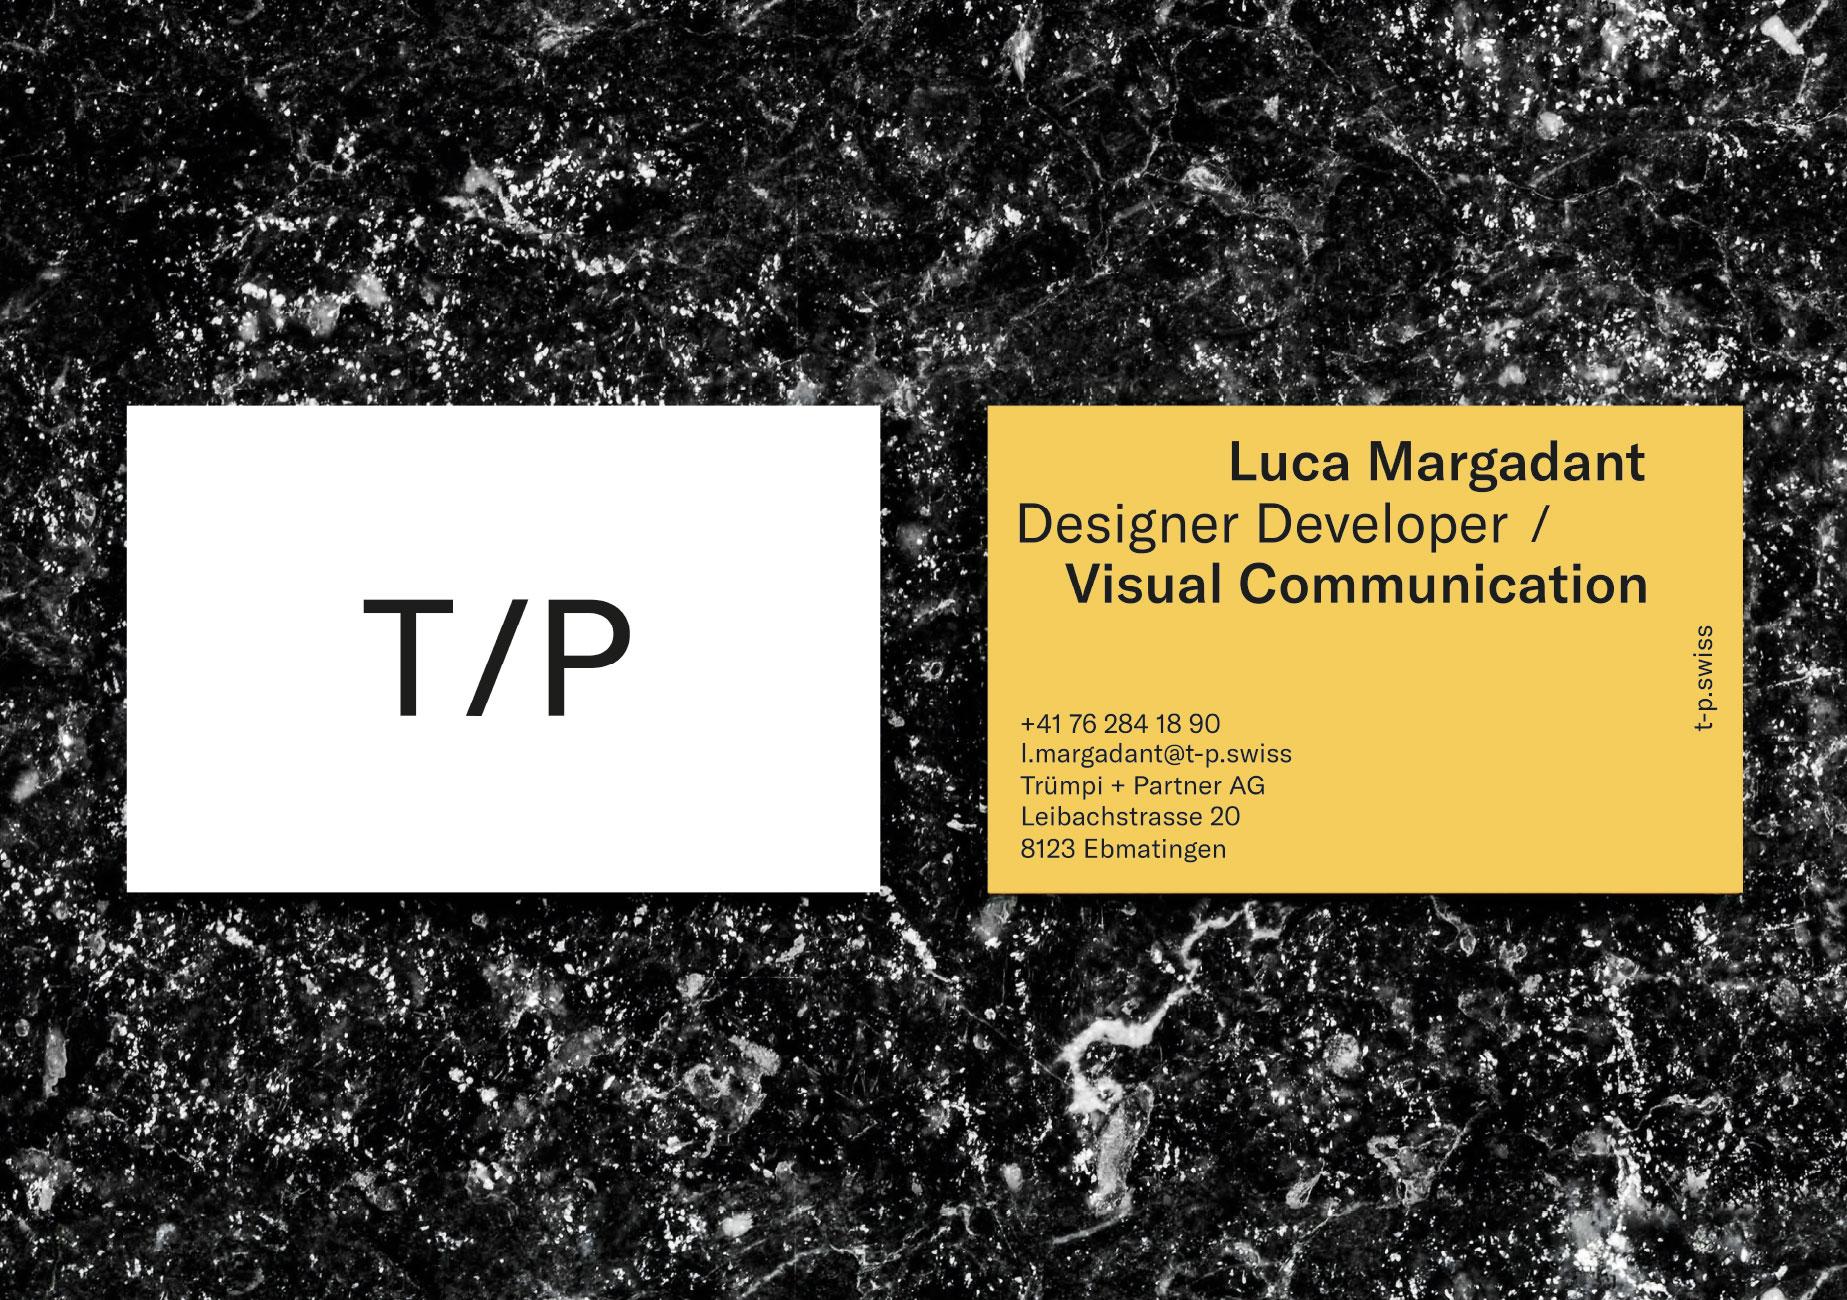 Another Studio Multidisziplinäres Design Studio Aus Zürich